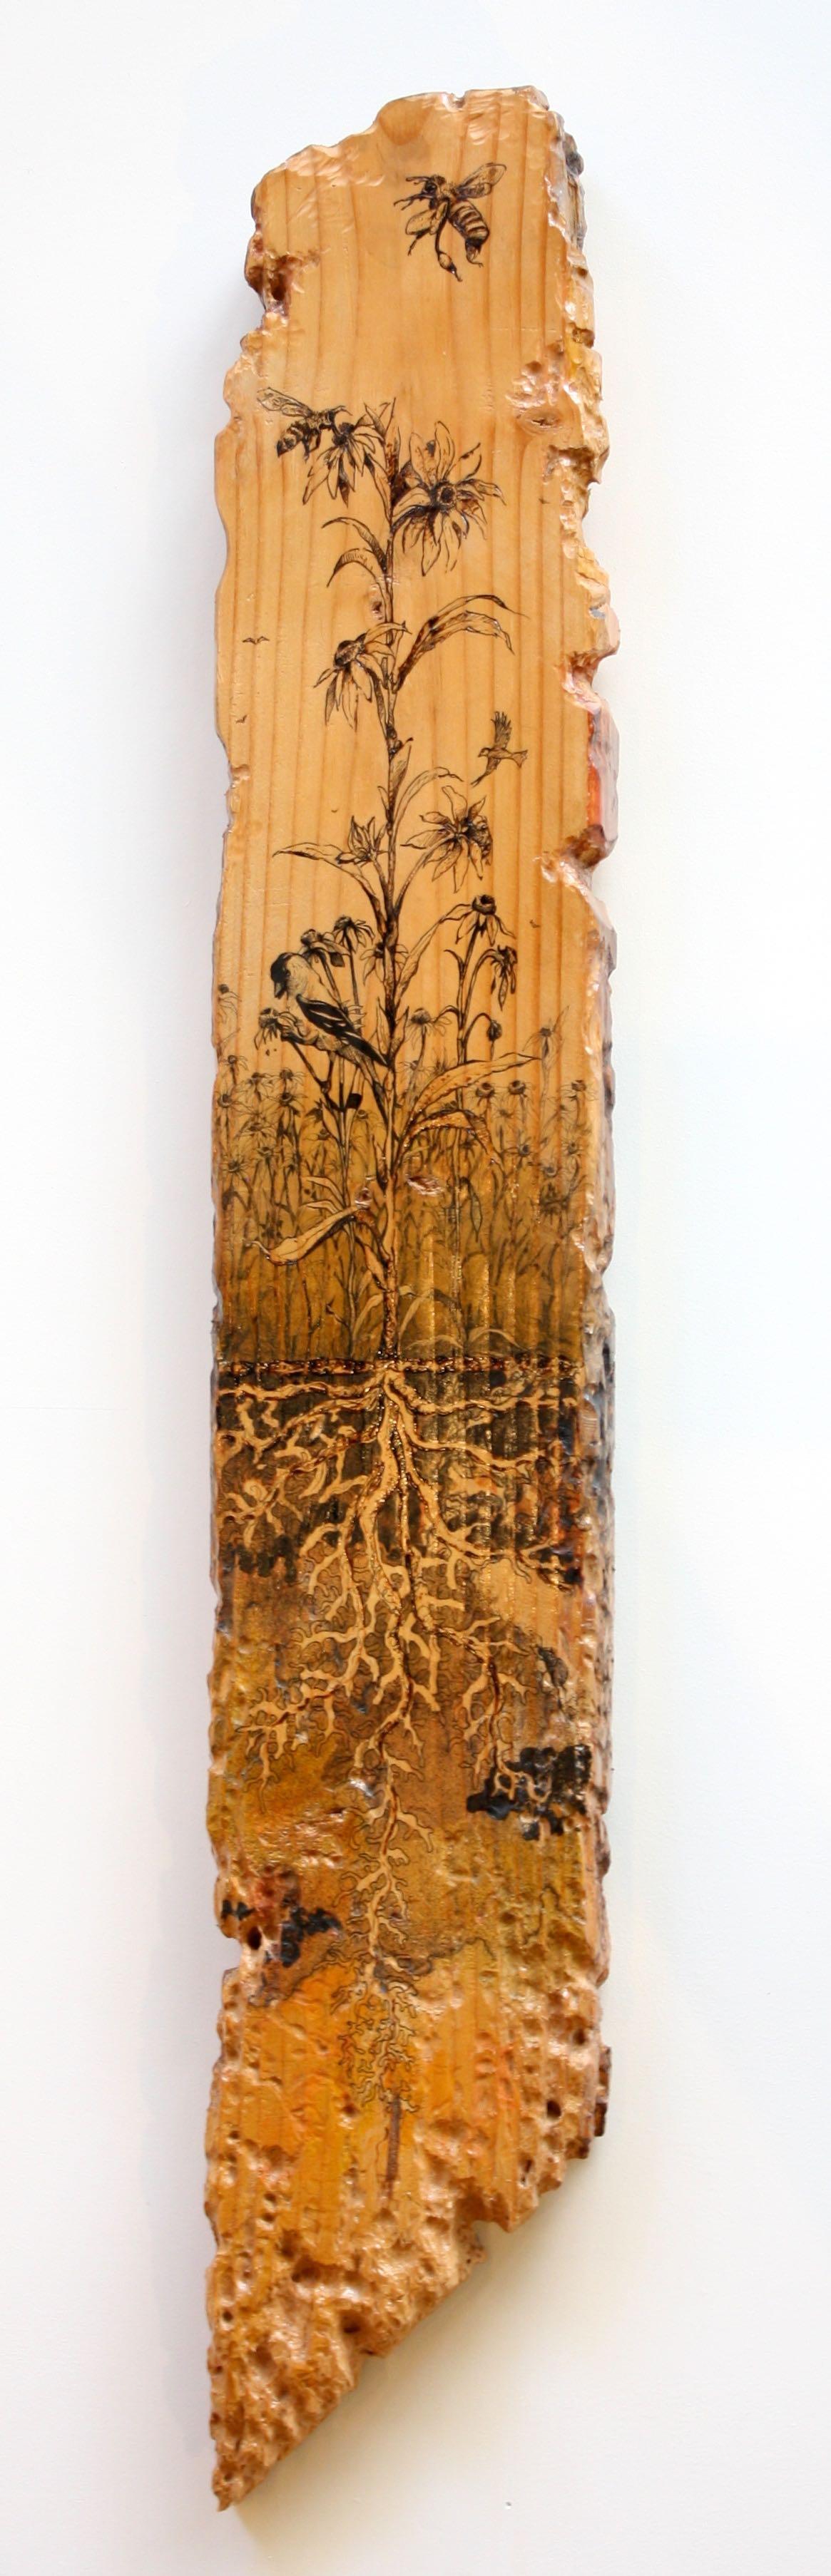 The Good Seed - 2014Acrylic ink/ pen/ woodburn on wood4